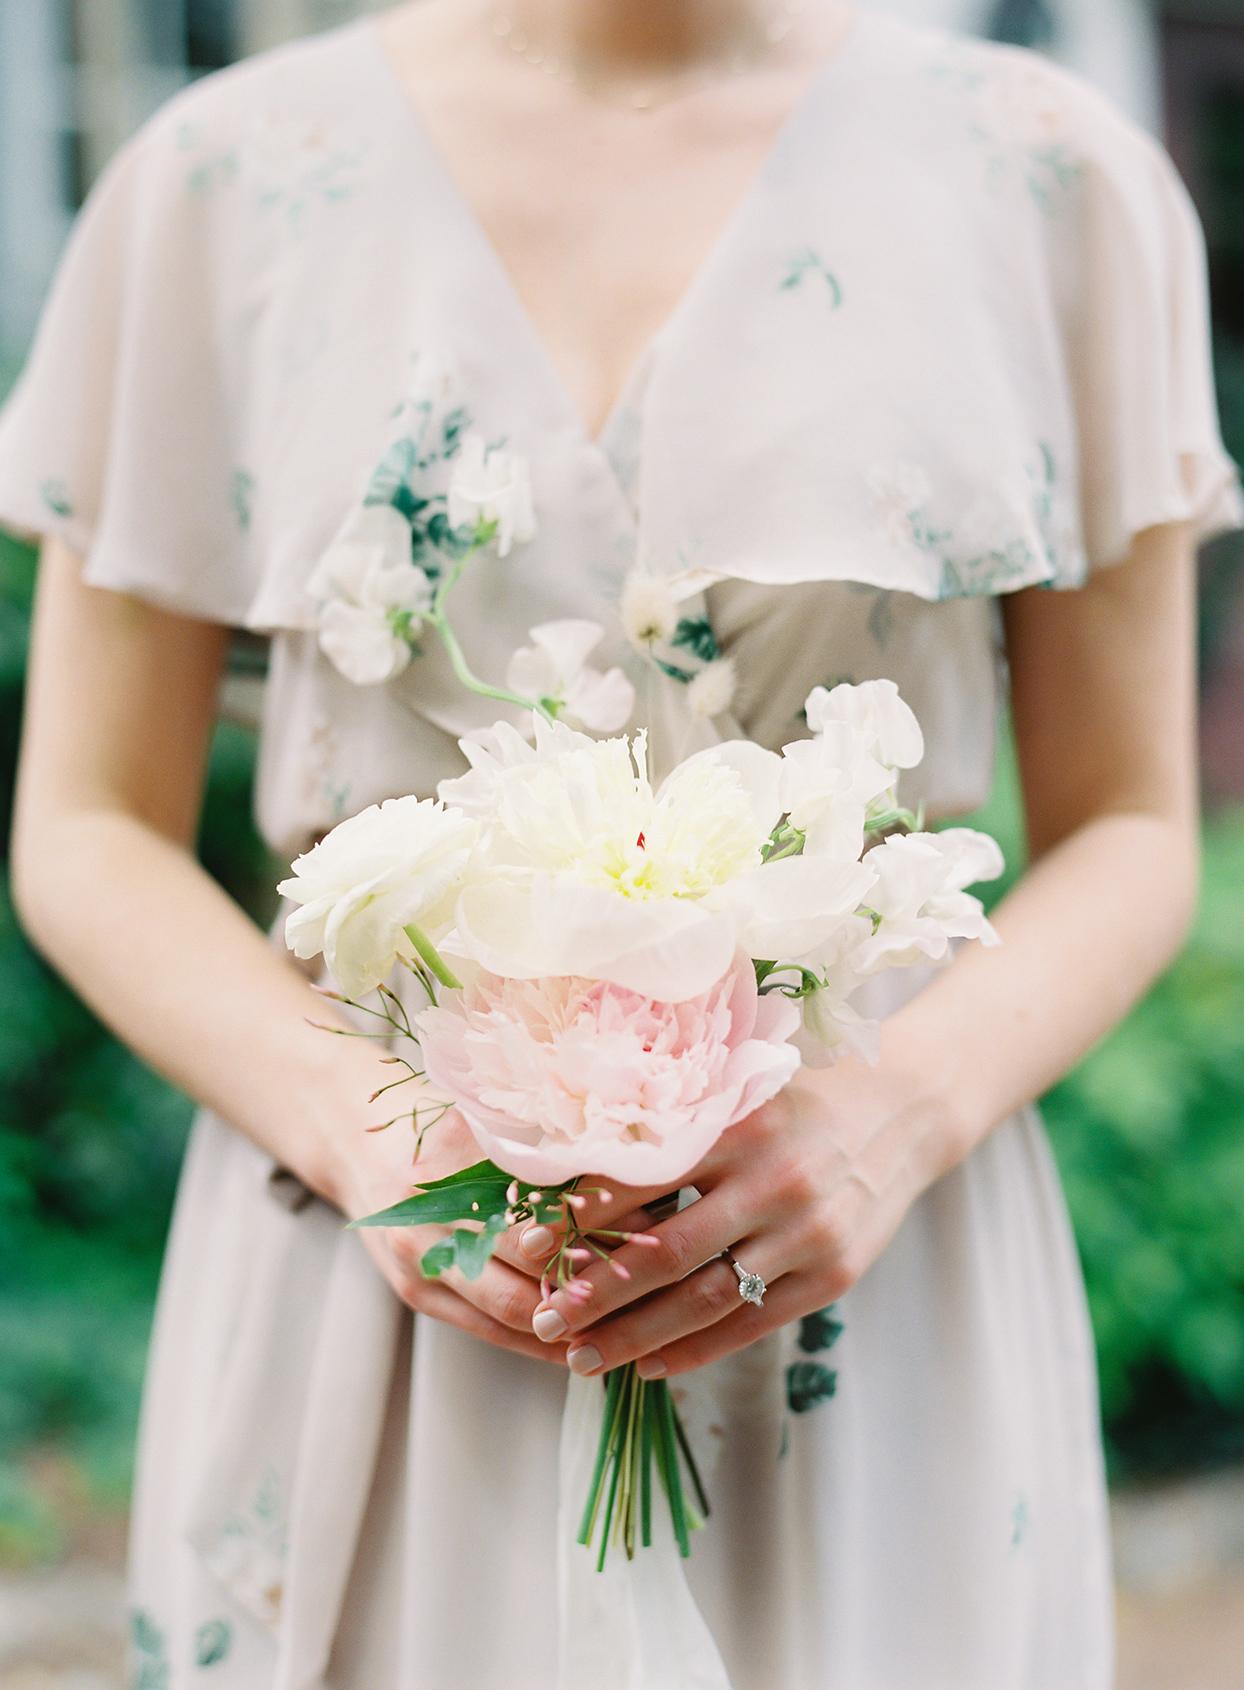 paula terence wedding bridesmaid bouquet